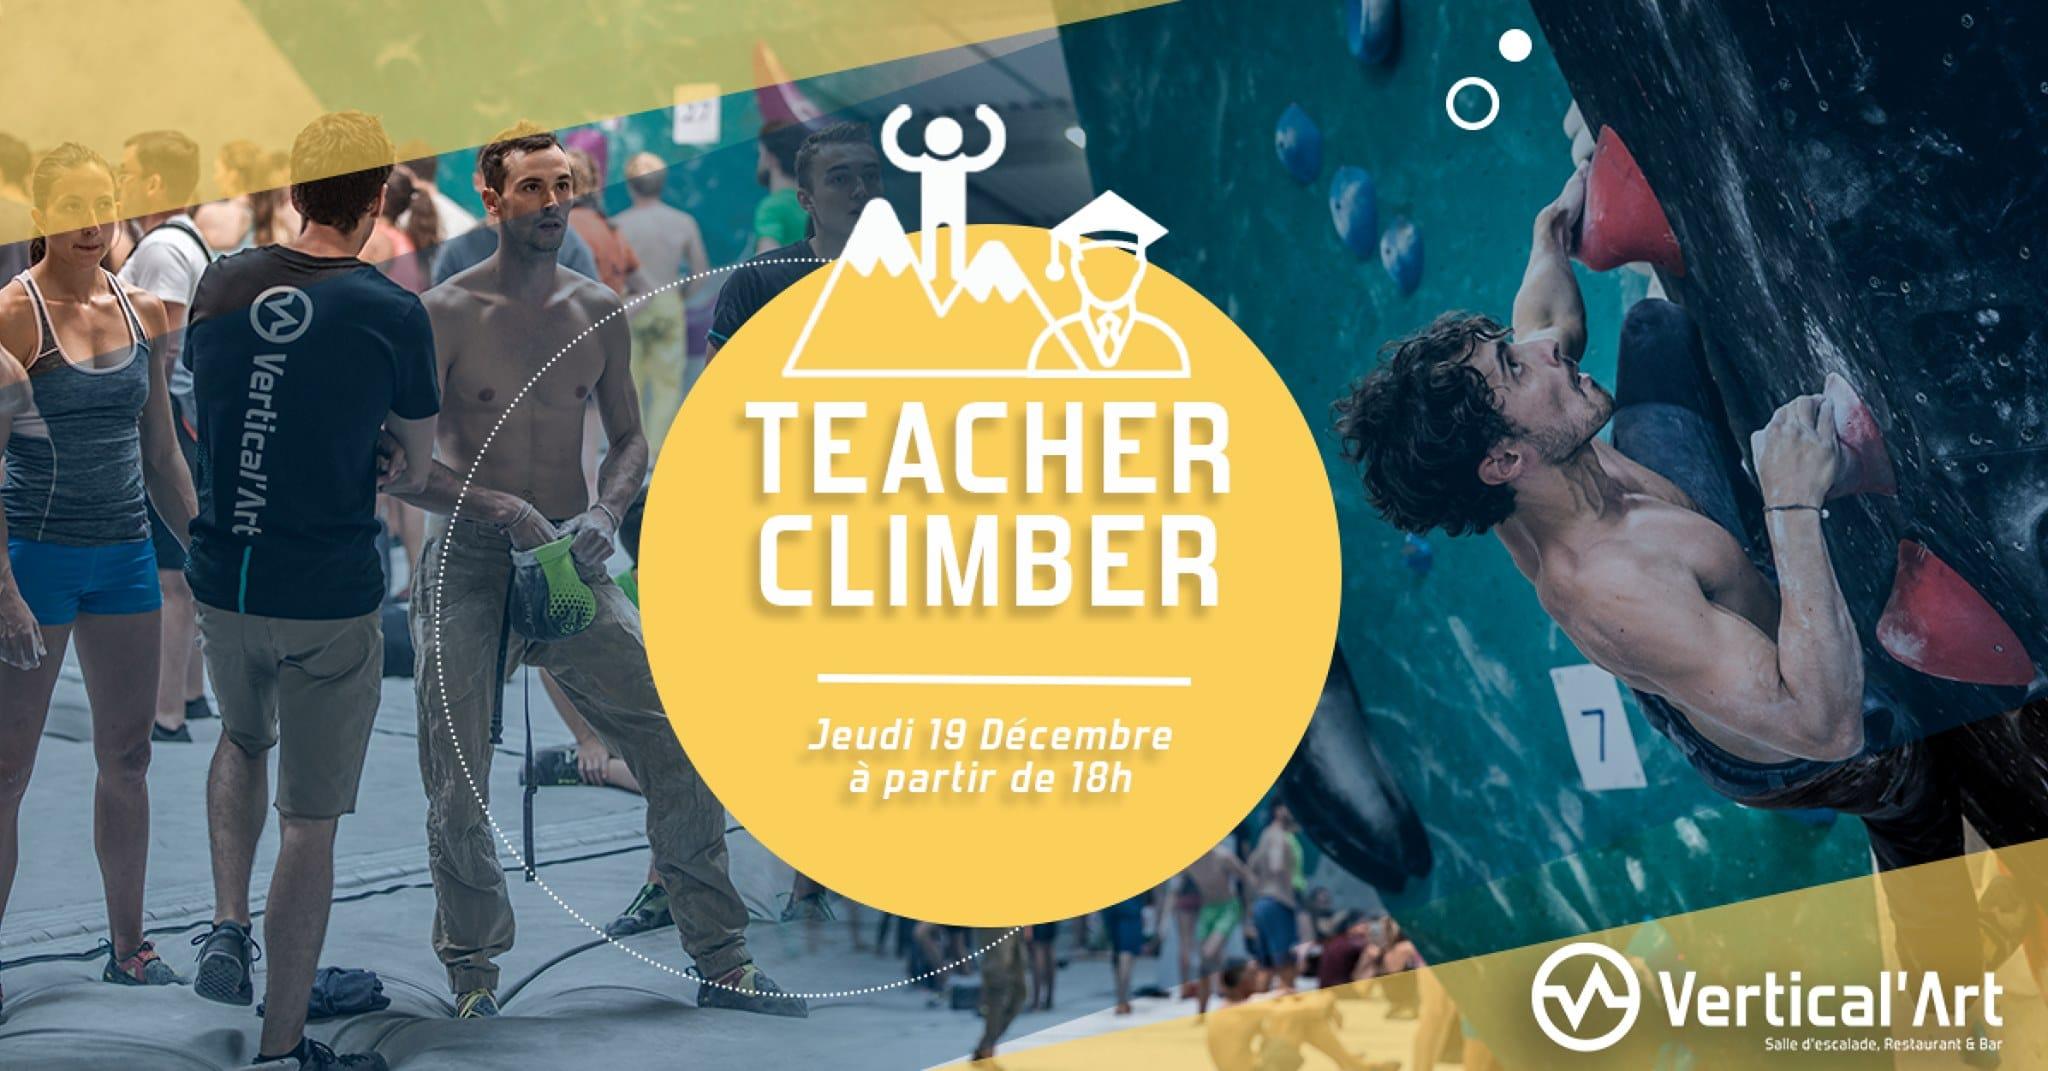 soirée encadrant lyon - Vertical'Art lyon - salle d'escalade restaurant bar - teacher climber - coaching gratuits